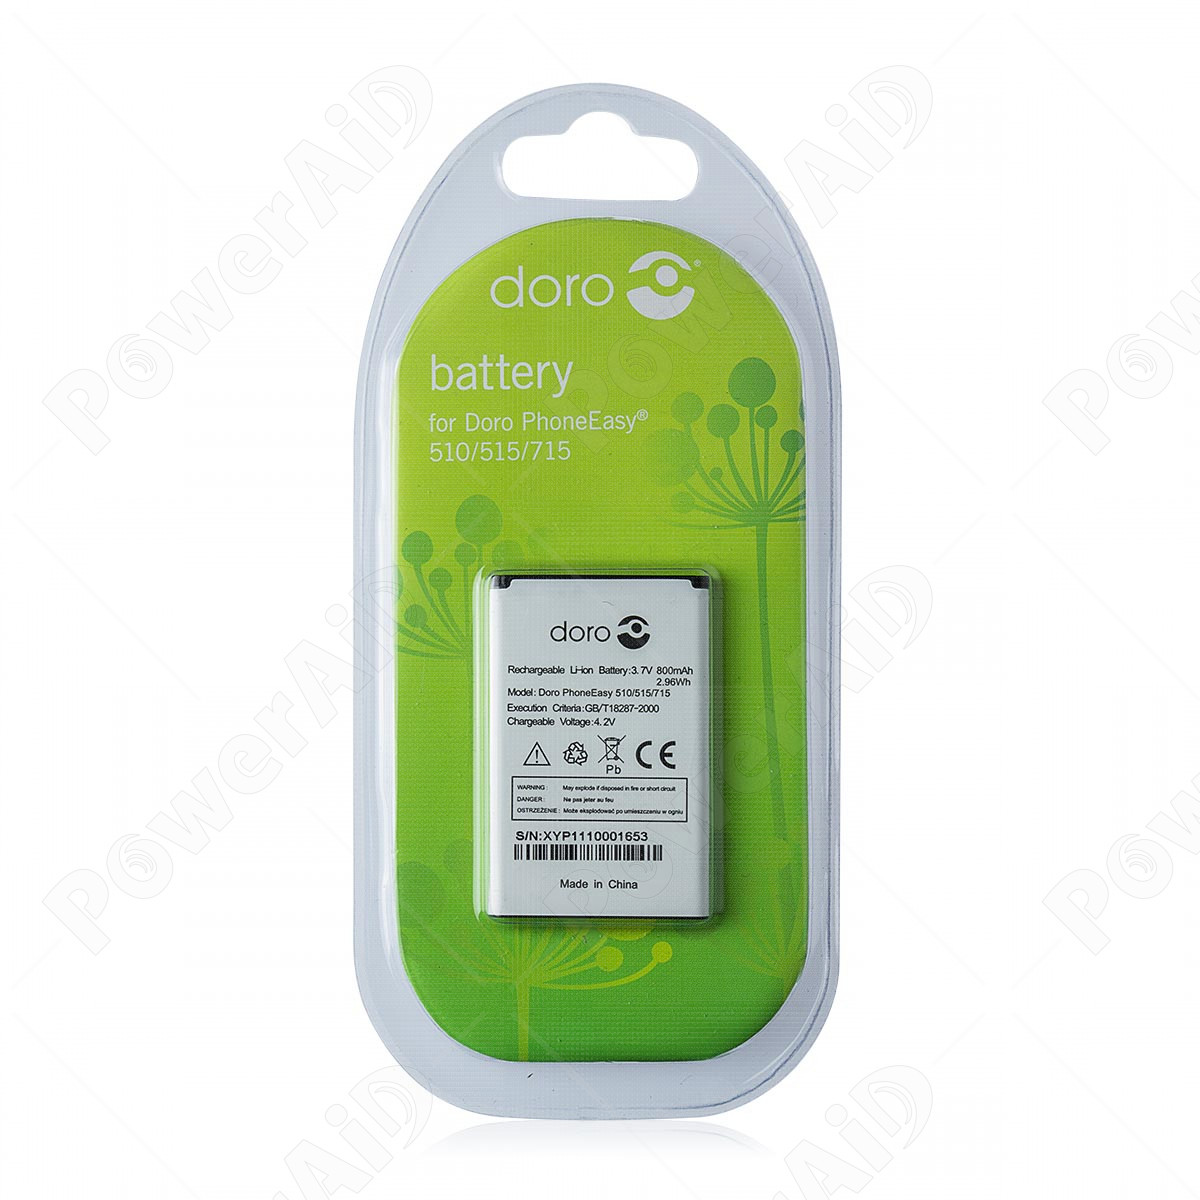 Doro - Batteria per PhoneEasy 50x / 510 / 515 / 715